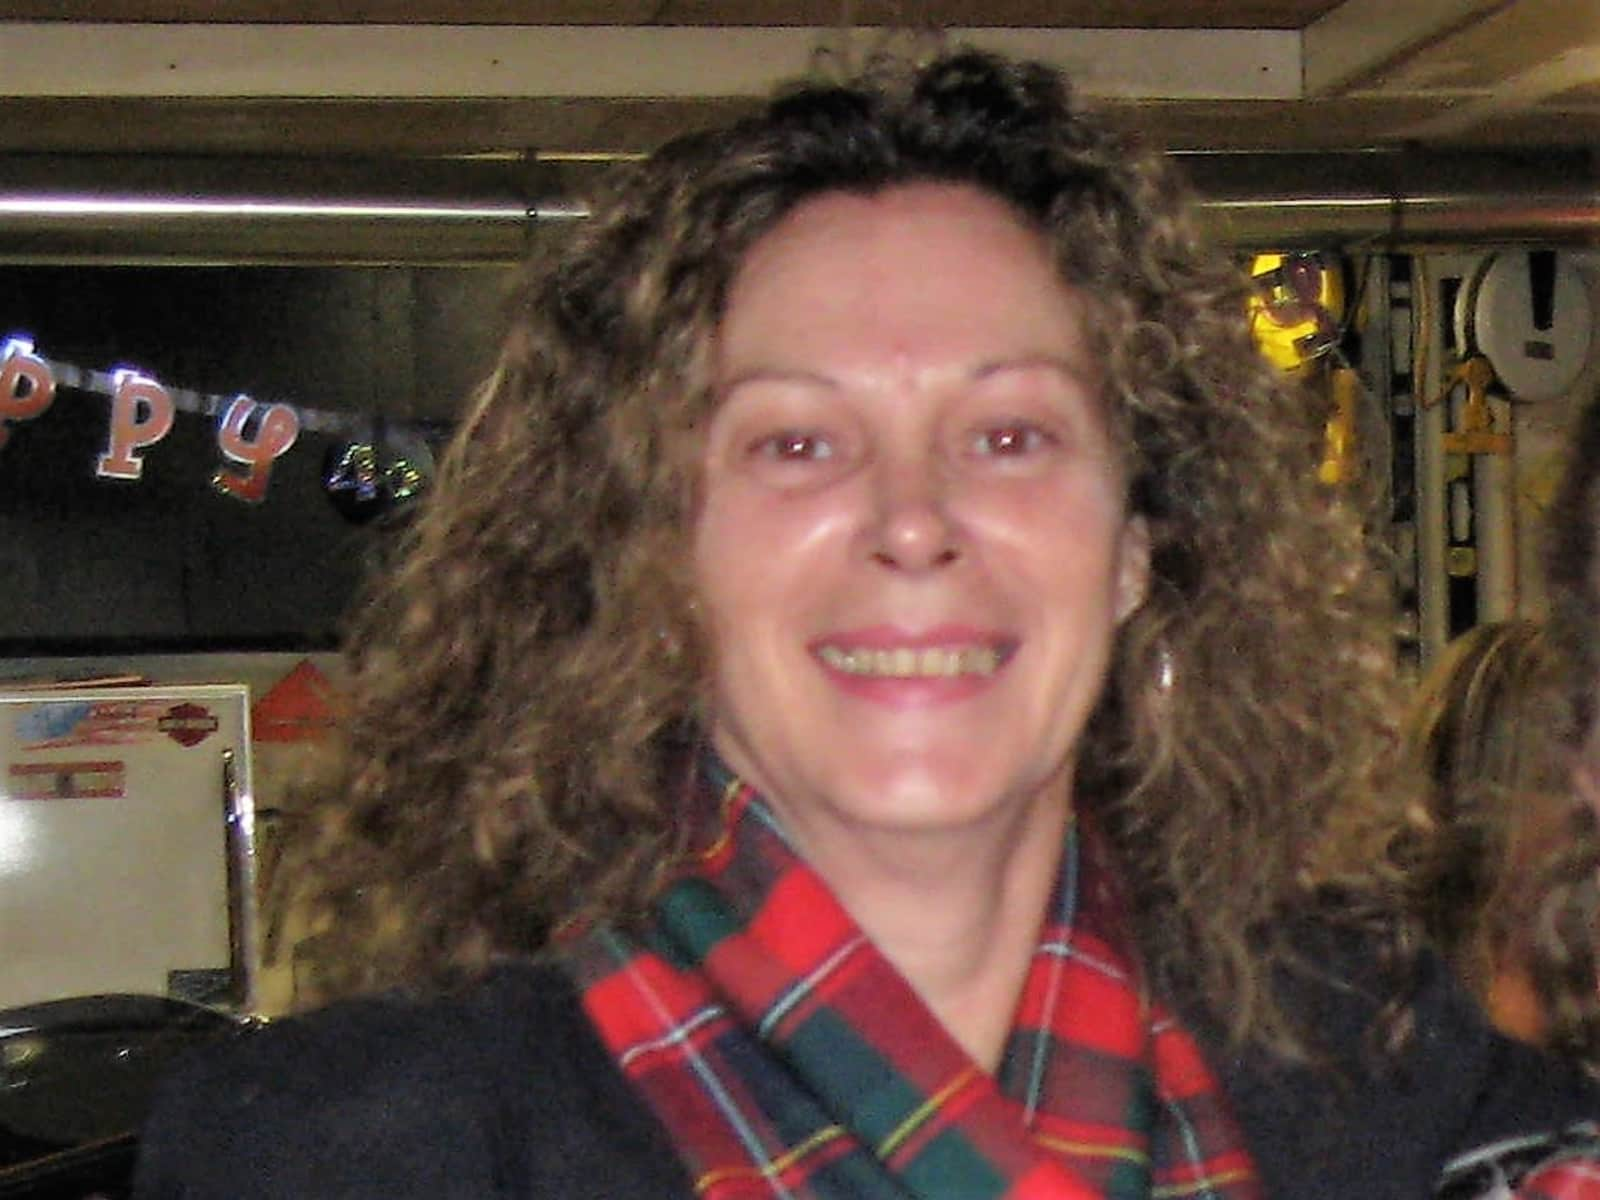 Claire from Halifax, Nova Scotia, Canada